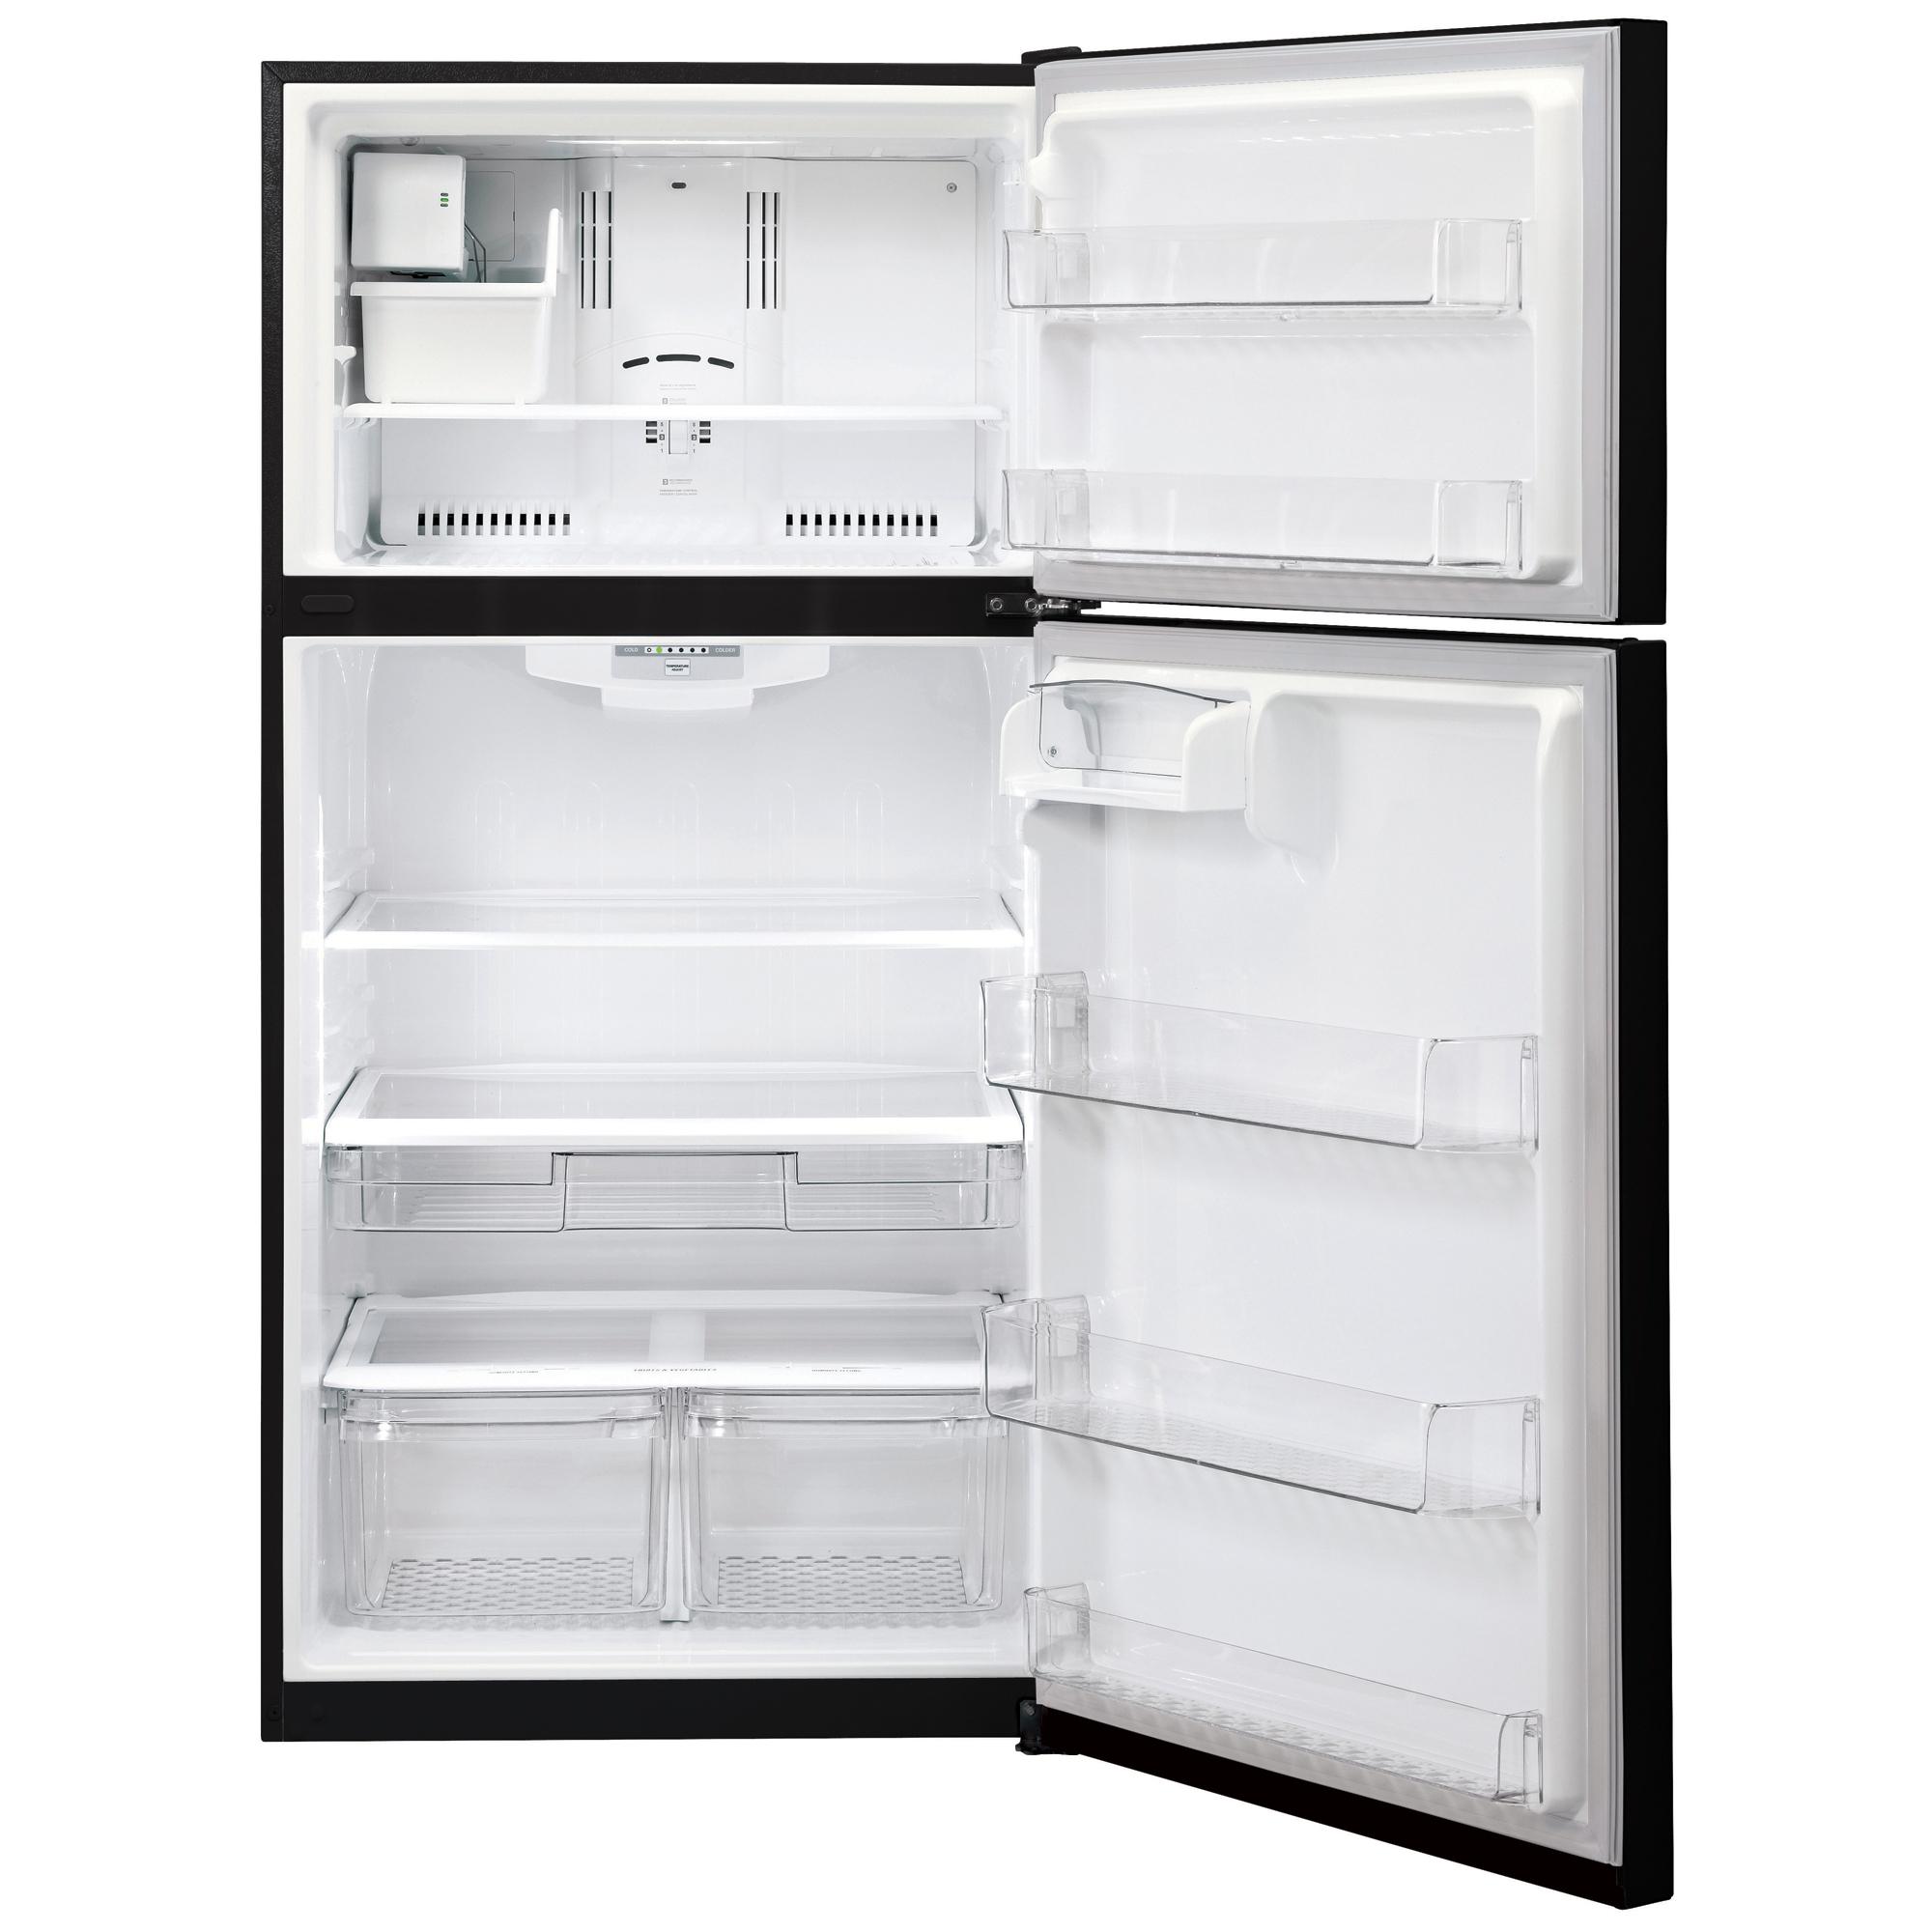 "LG LTCS20220B 20.2 cu. ft. Top Freezer Refrigerator w/ Ice Maker (30"" Wide) – Black"